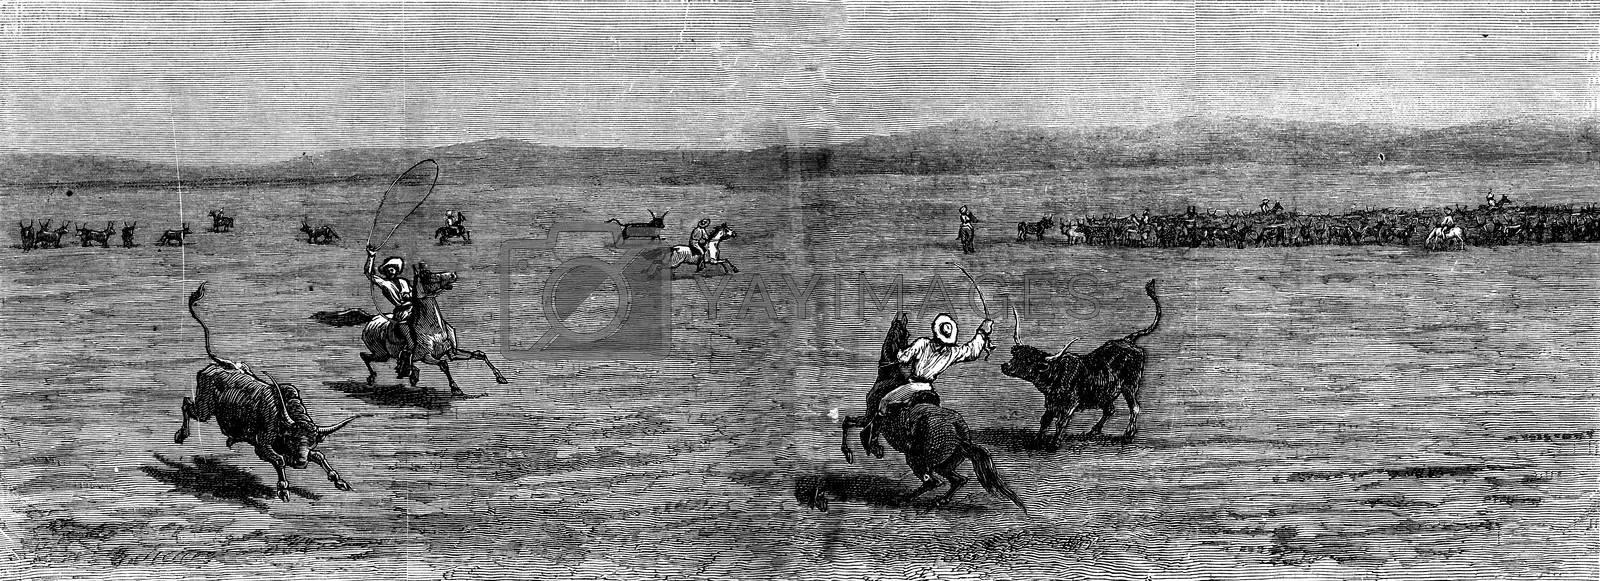 Herds in the distance. The lasso, vintage engraved illustration. Journal des Voyages, Travel Journal, (1879-80).